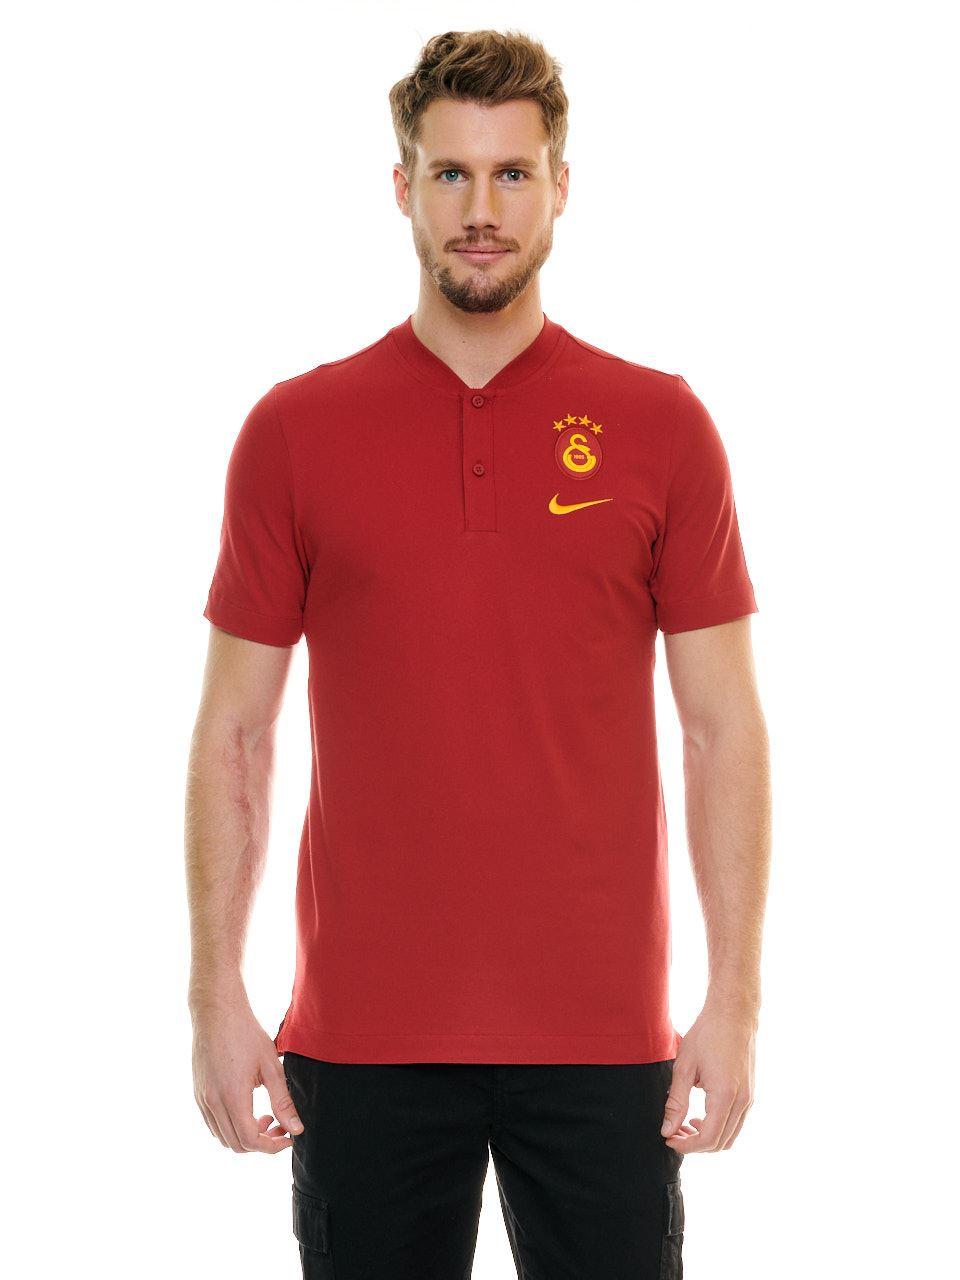 Nike Galatasaray T-shirt Ck306-630